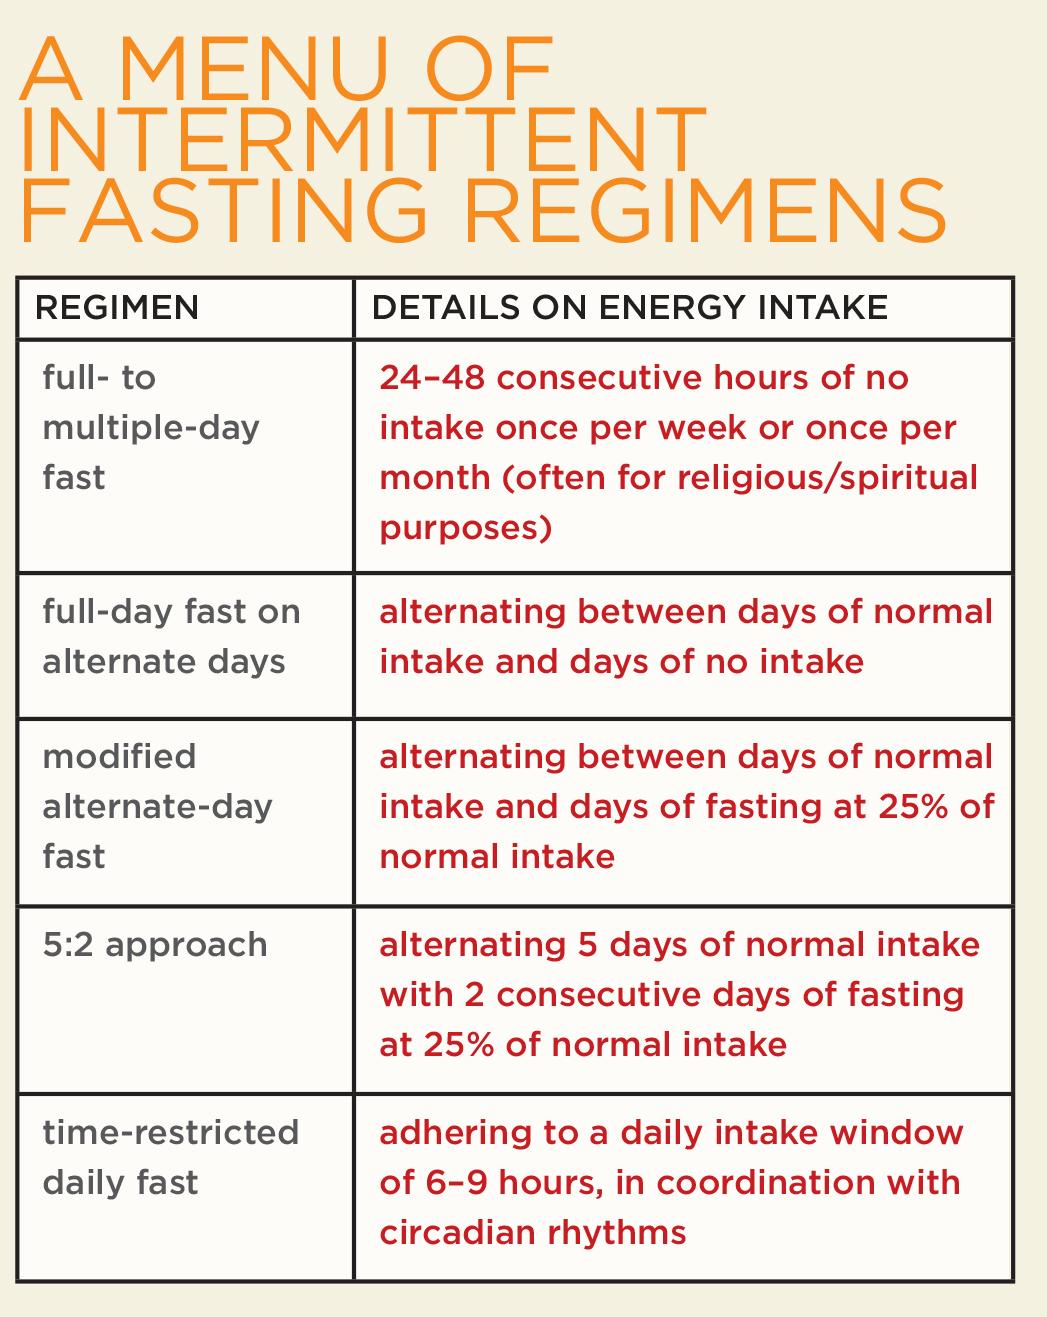 Intermittent fasting regimens